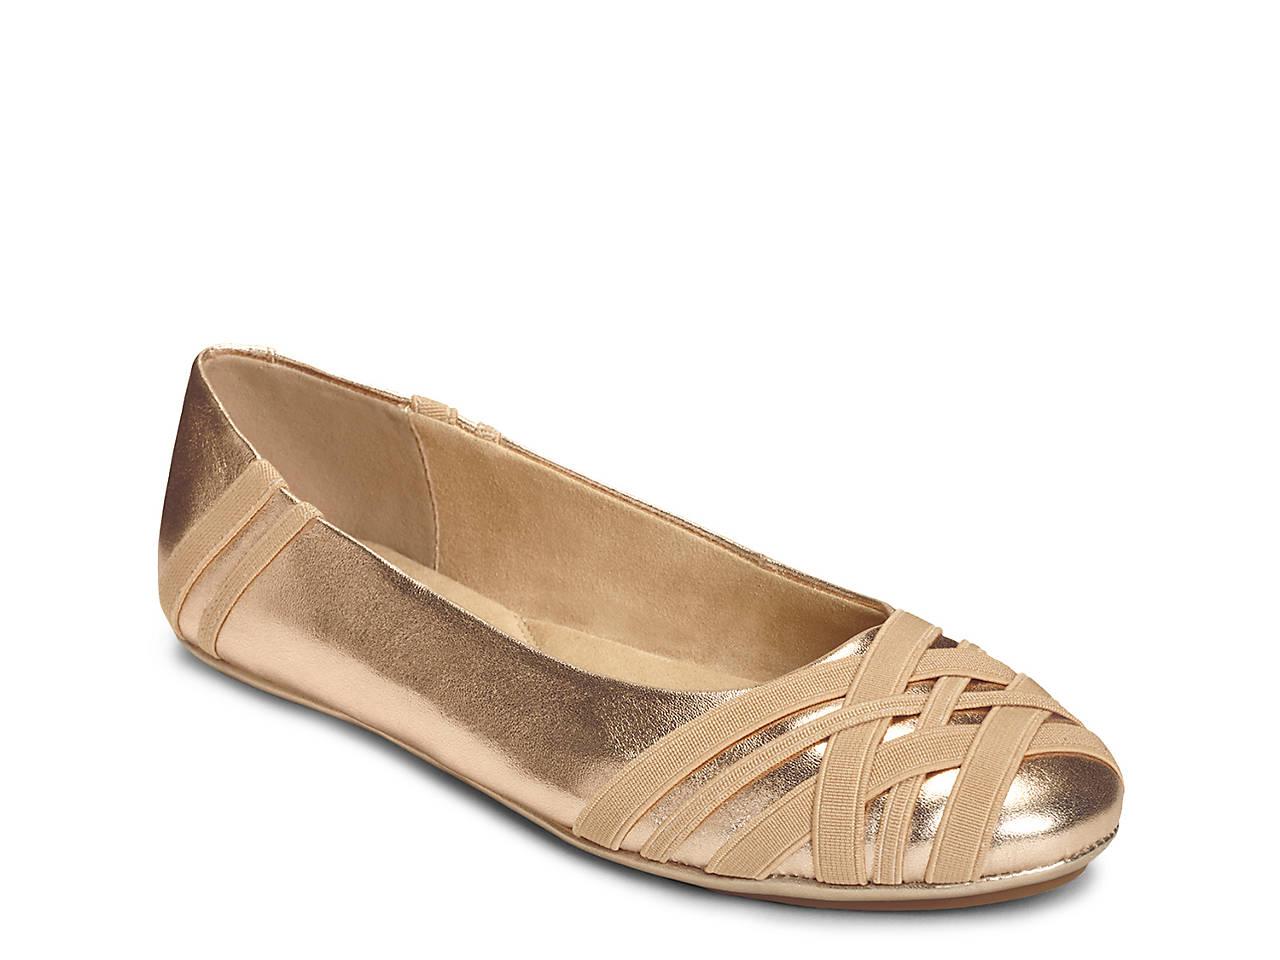 79a28dbafb7 Aerosoles Saturn Ballet Flat Women s Shoes